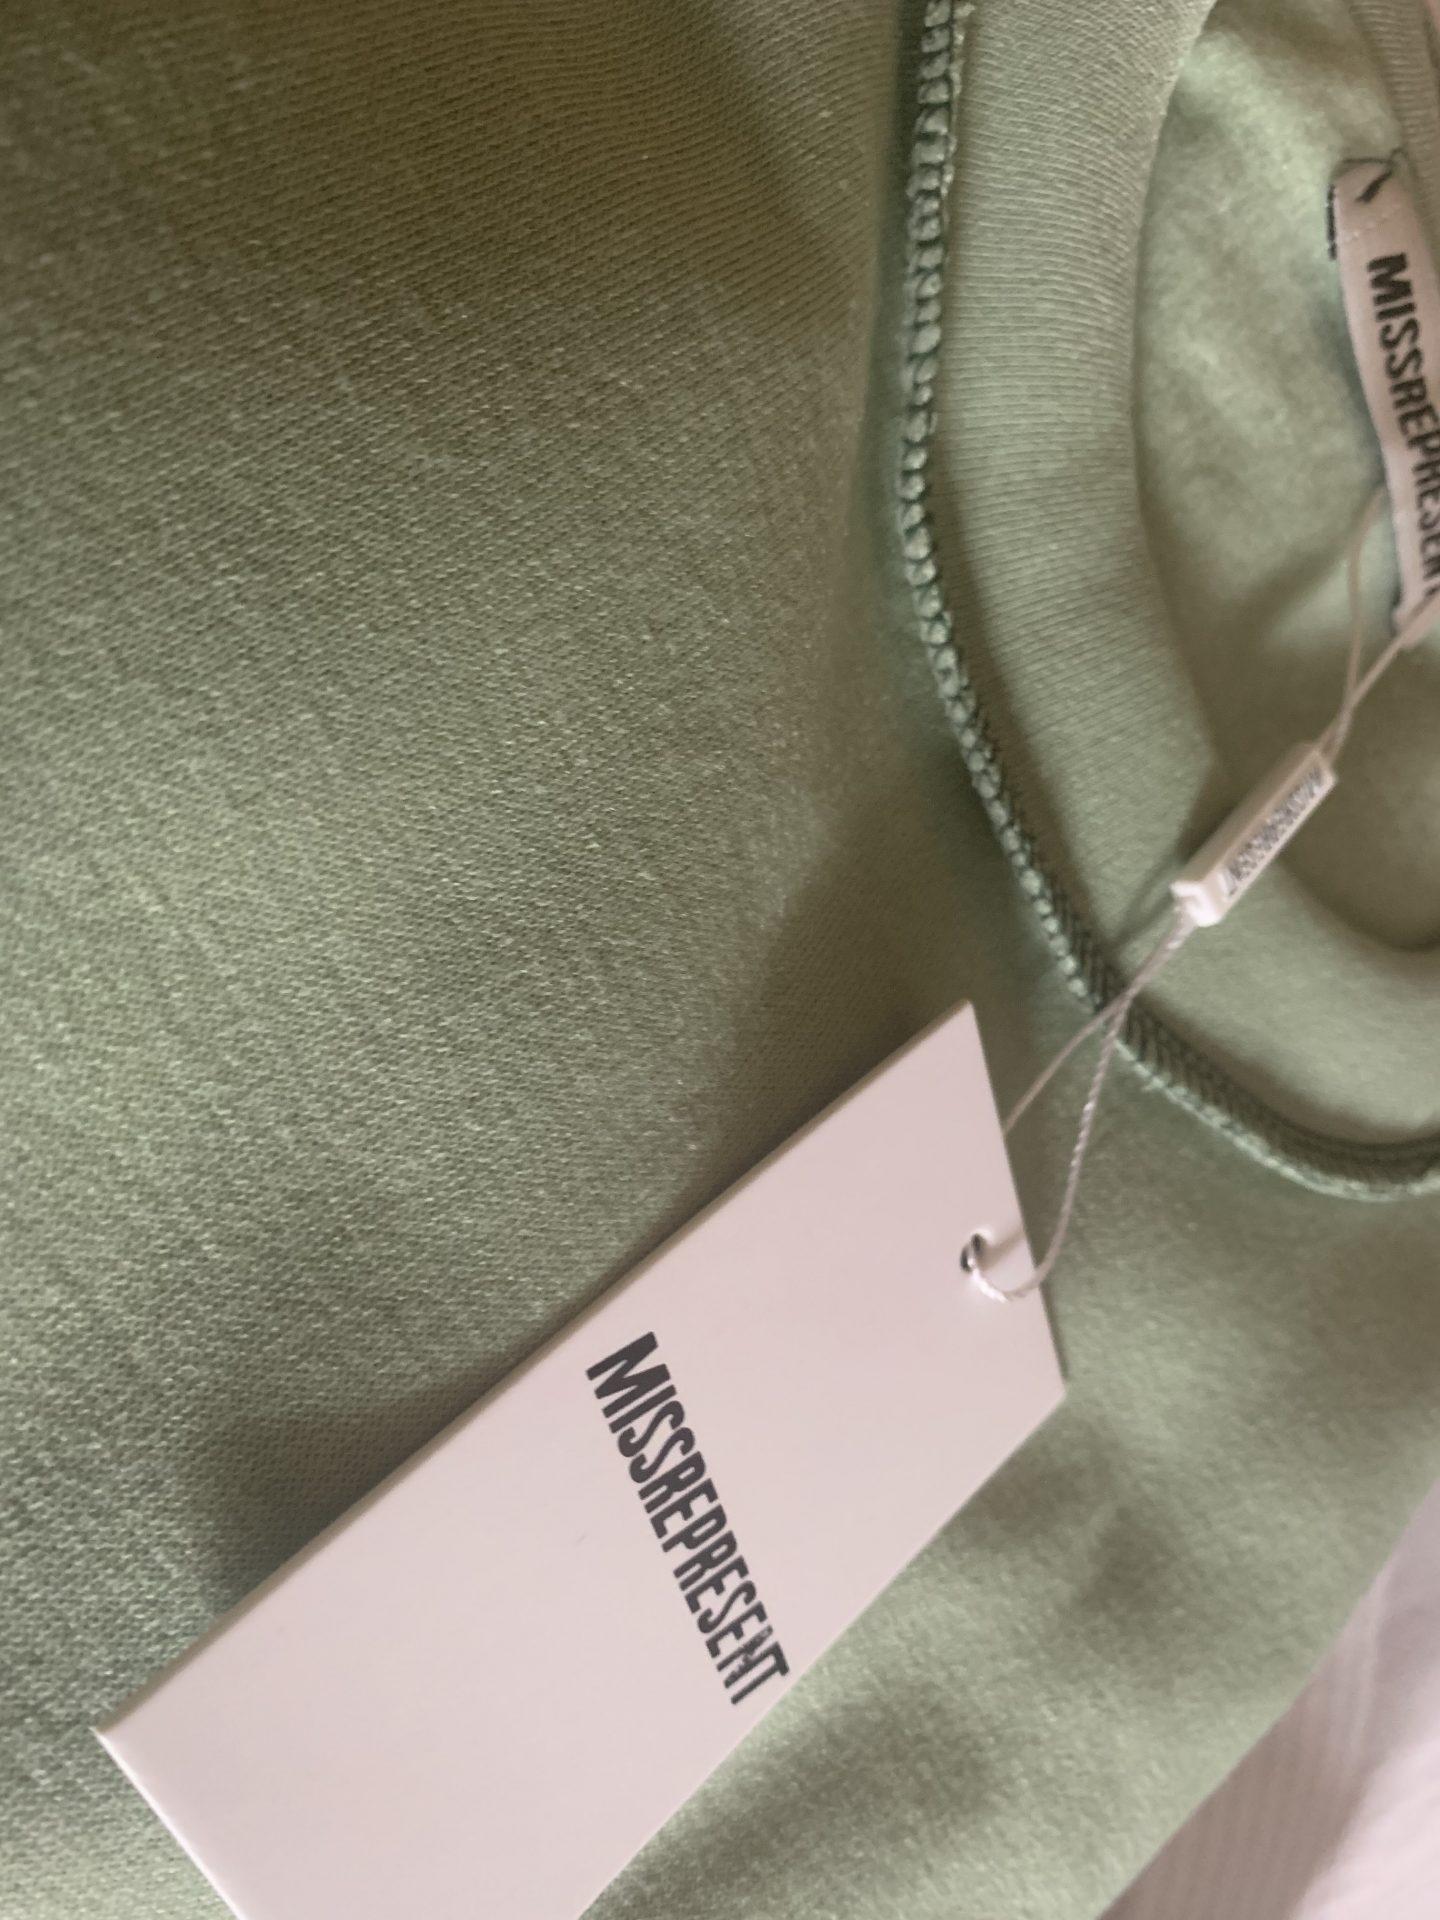 MREP tag on green tracksuit